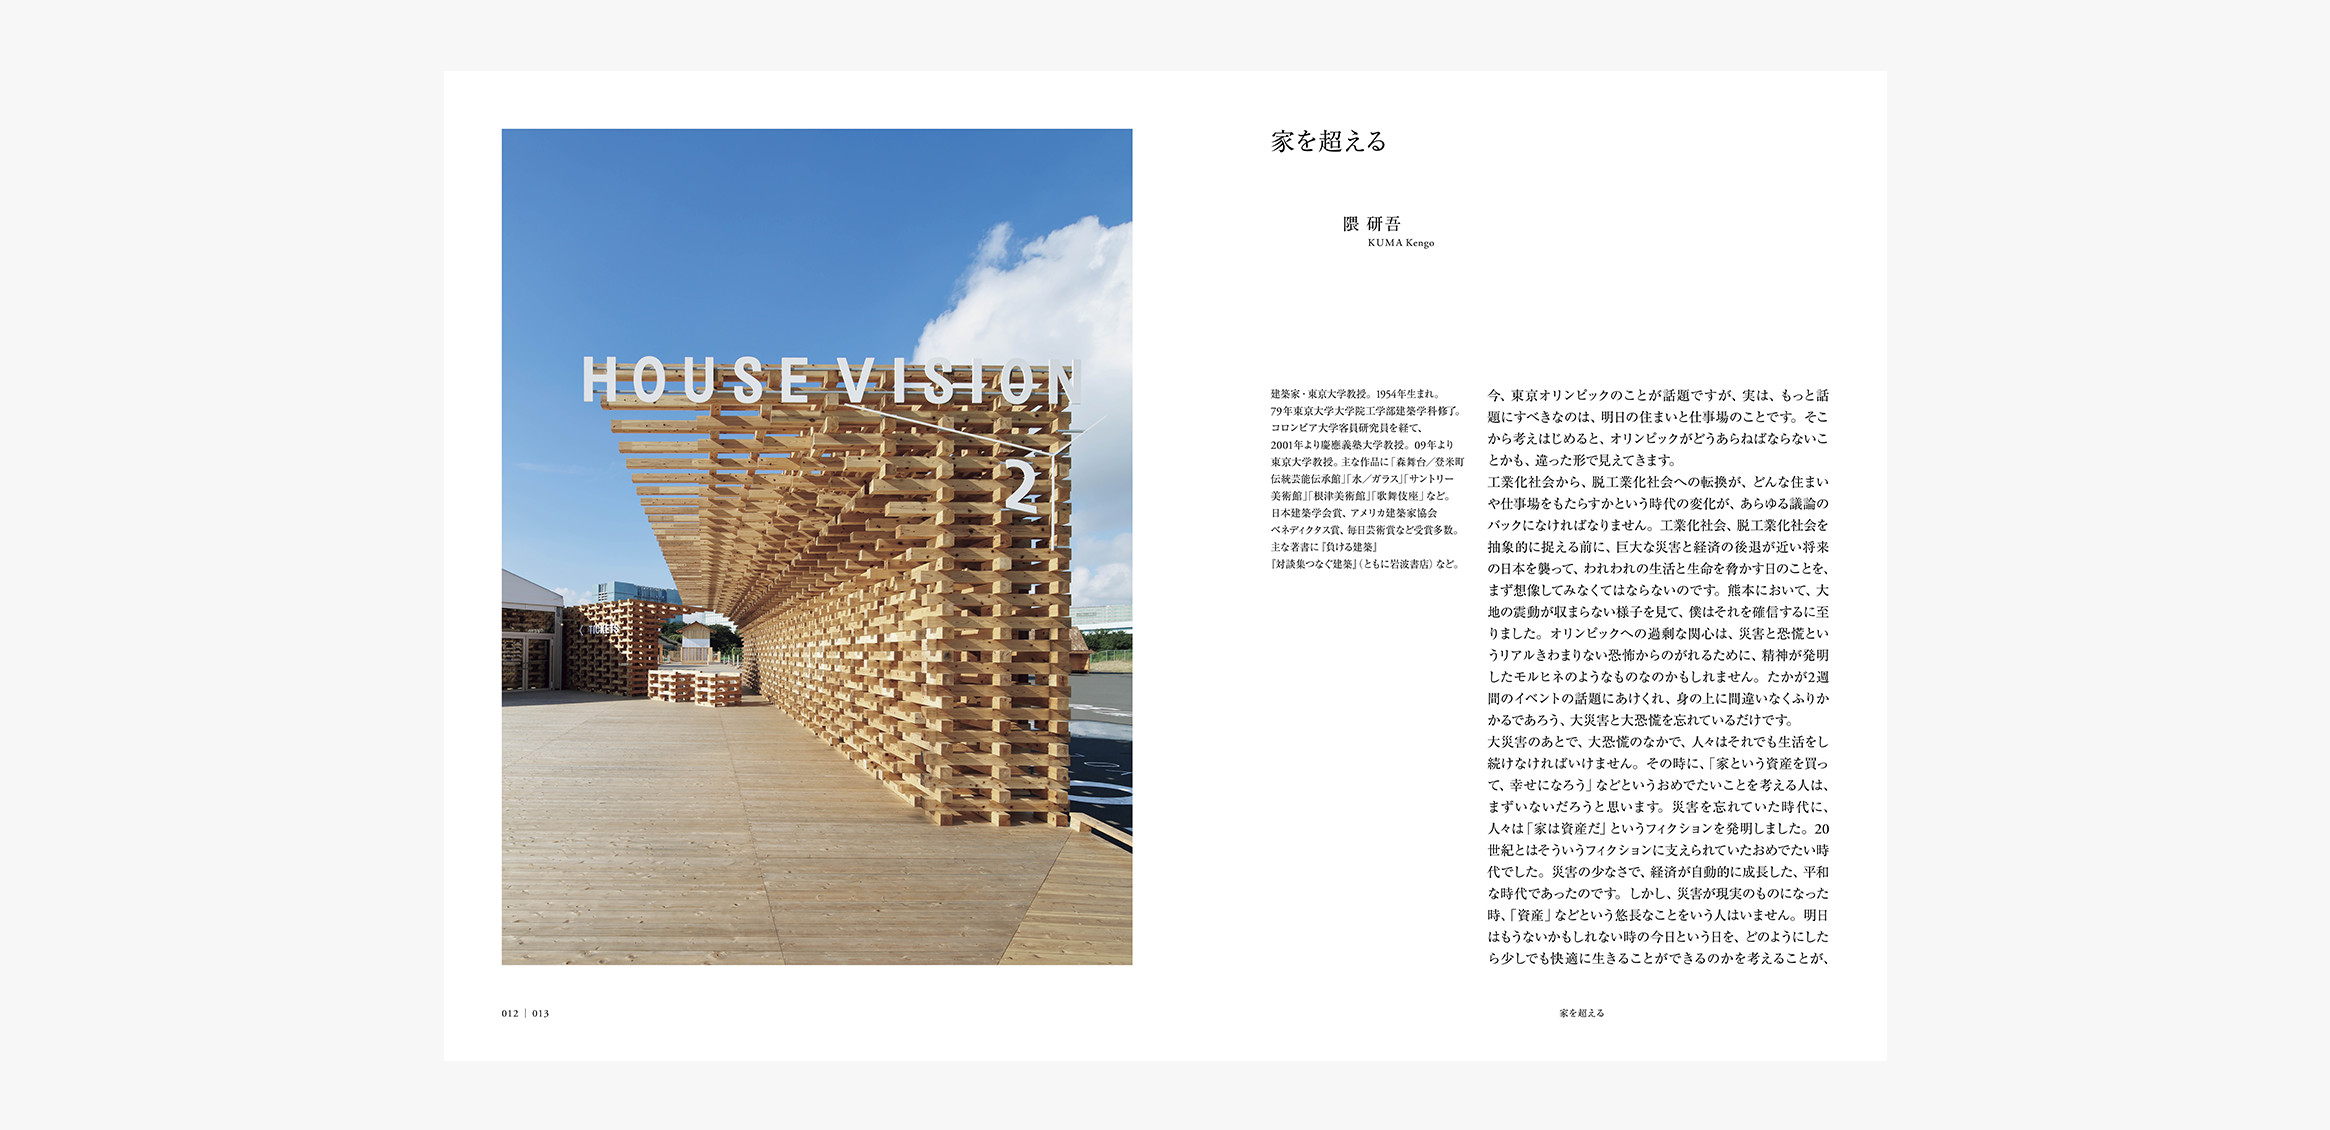 HOUSE VISION 2 2016 TOKYO EXHIBITION3枚目